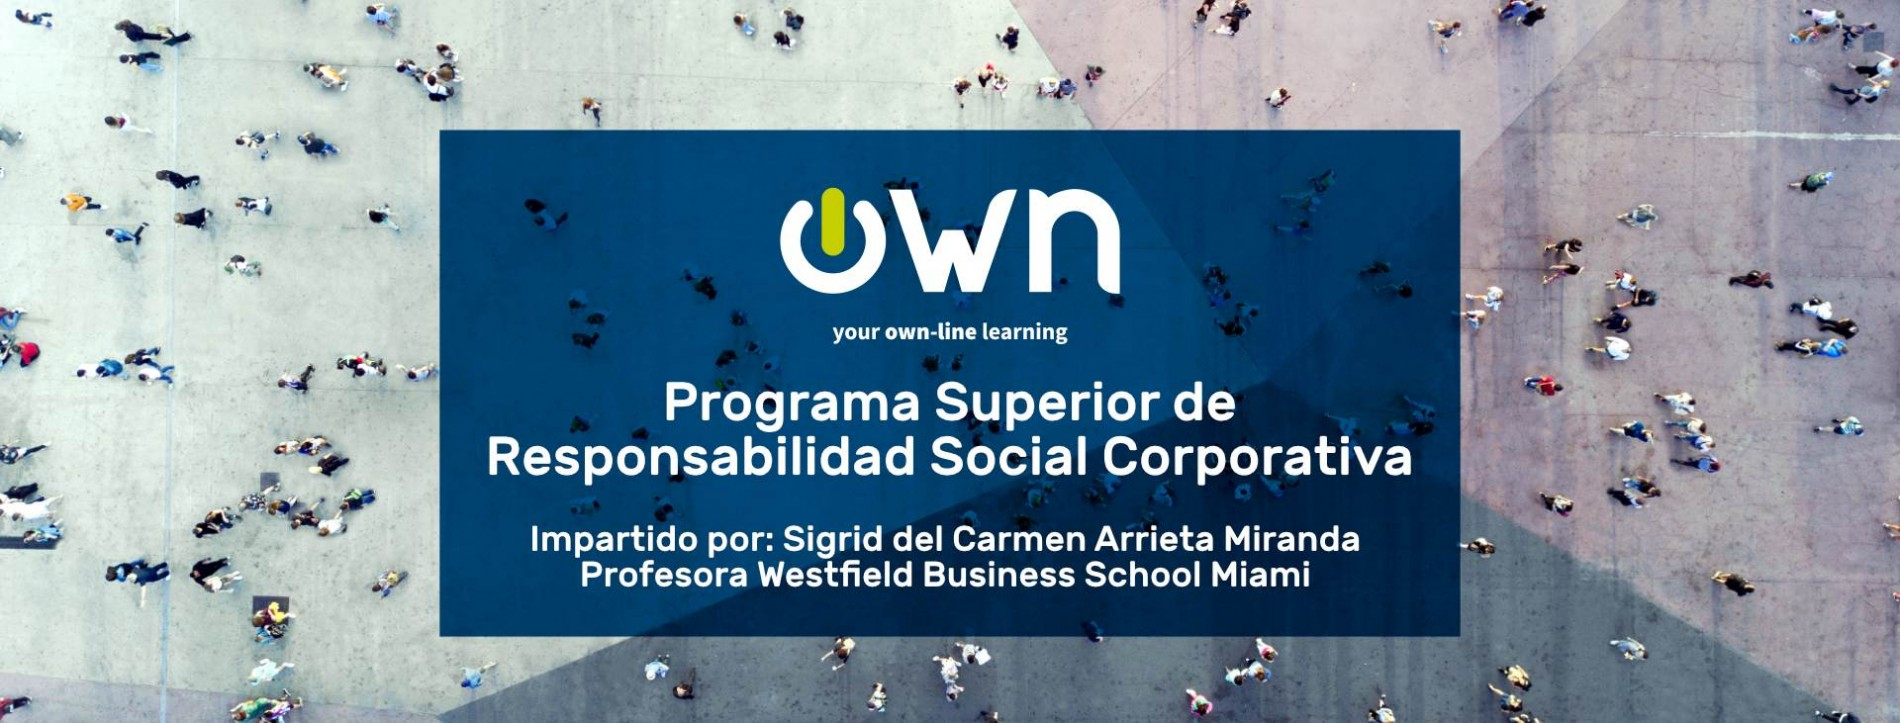 Curso Responsabilidad Social Corporativa